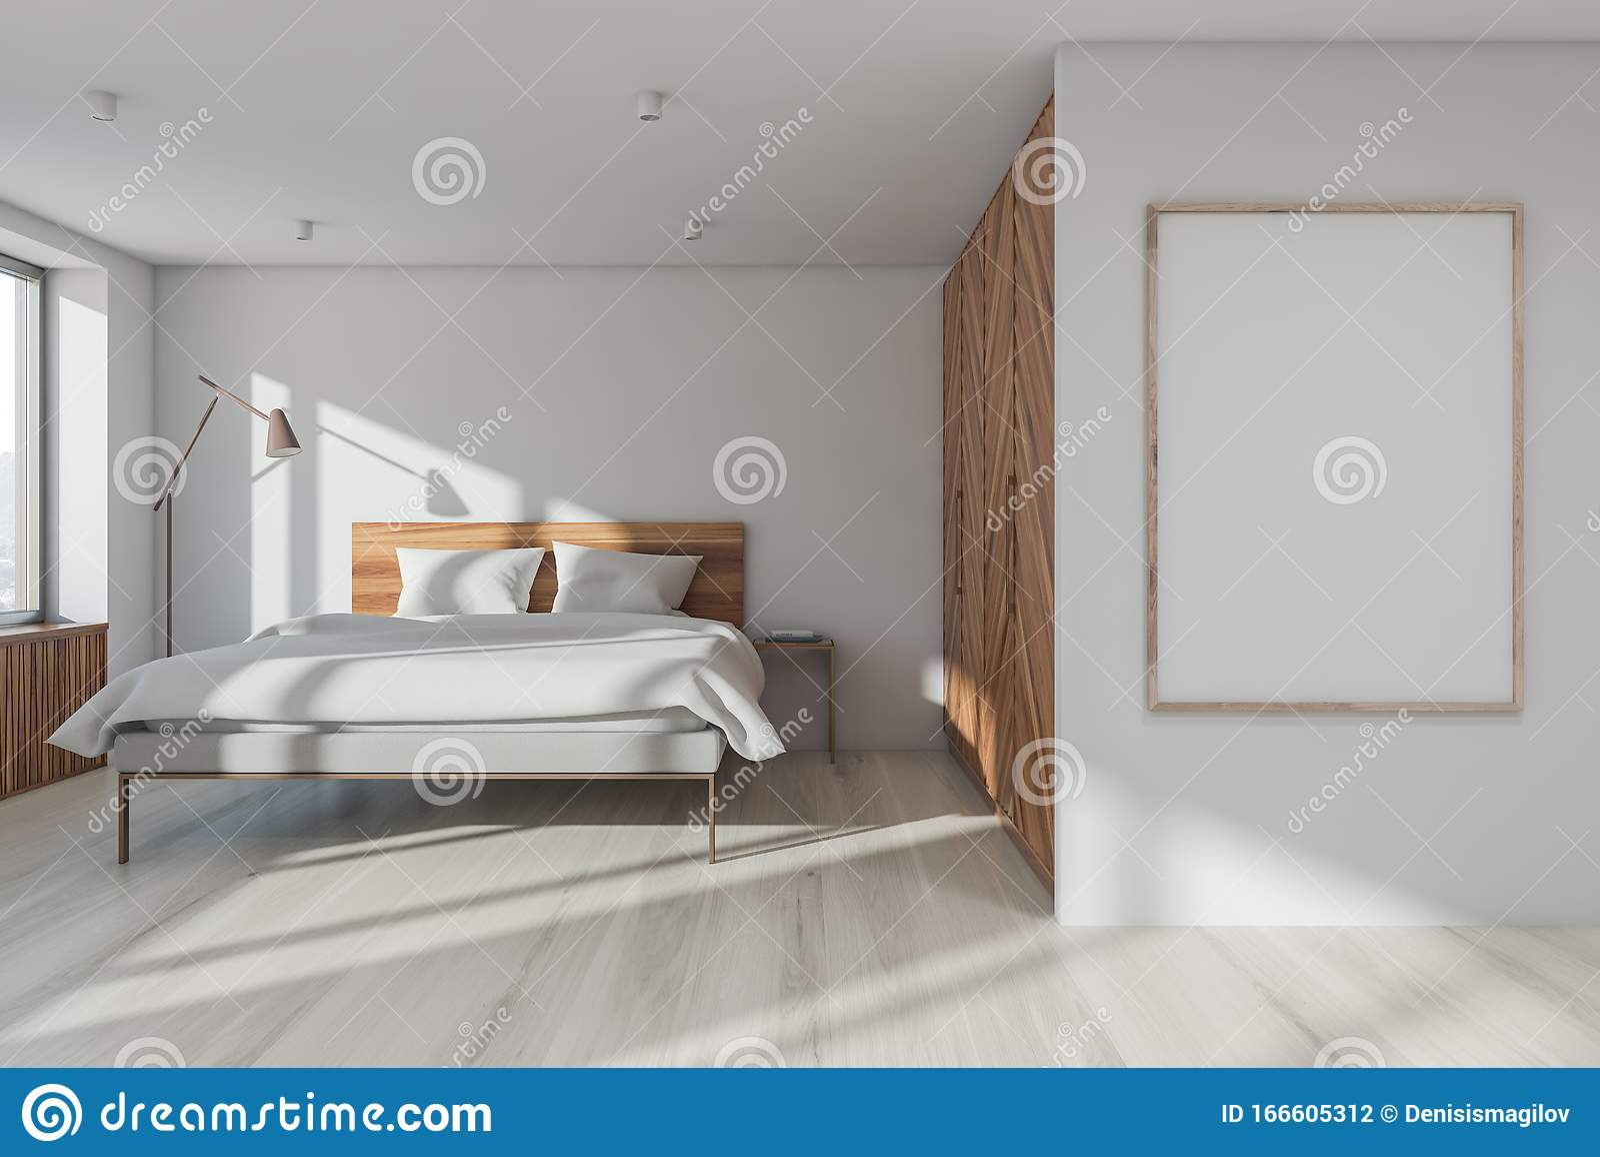 White Master Bedroom Interior With Poster Frame Stock Illustration Illustration Of Interior Master 166605312